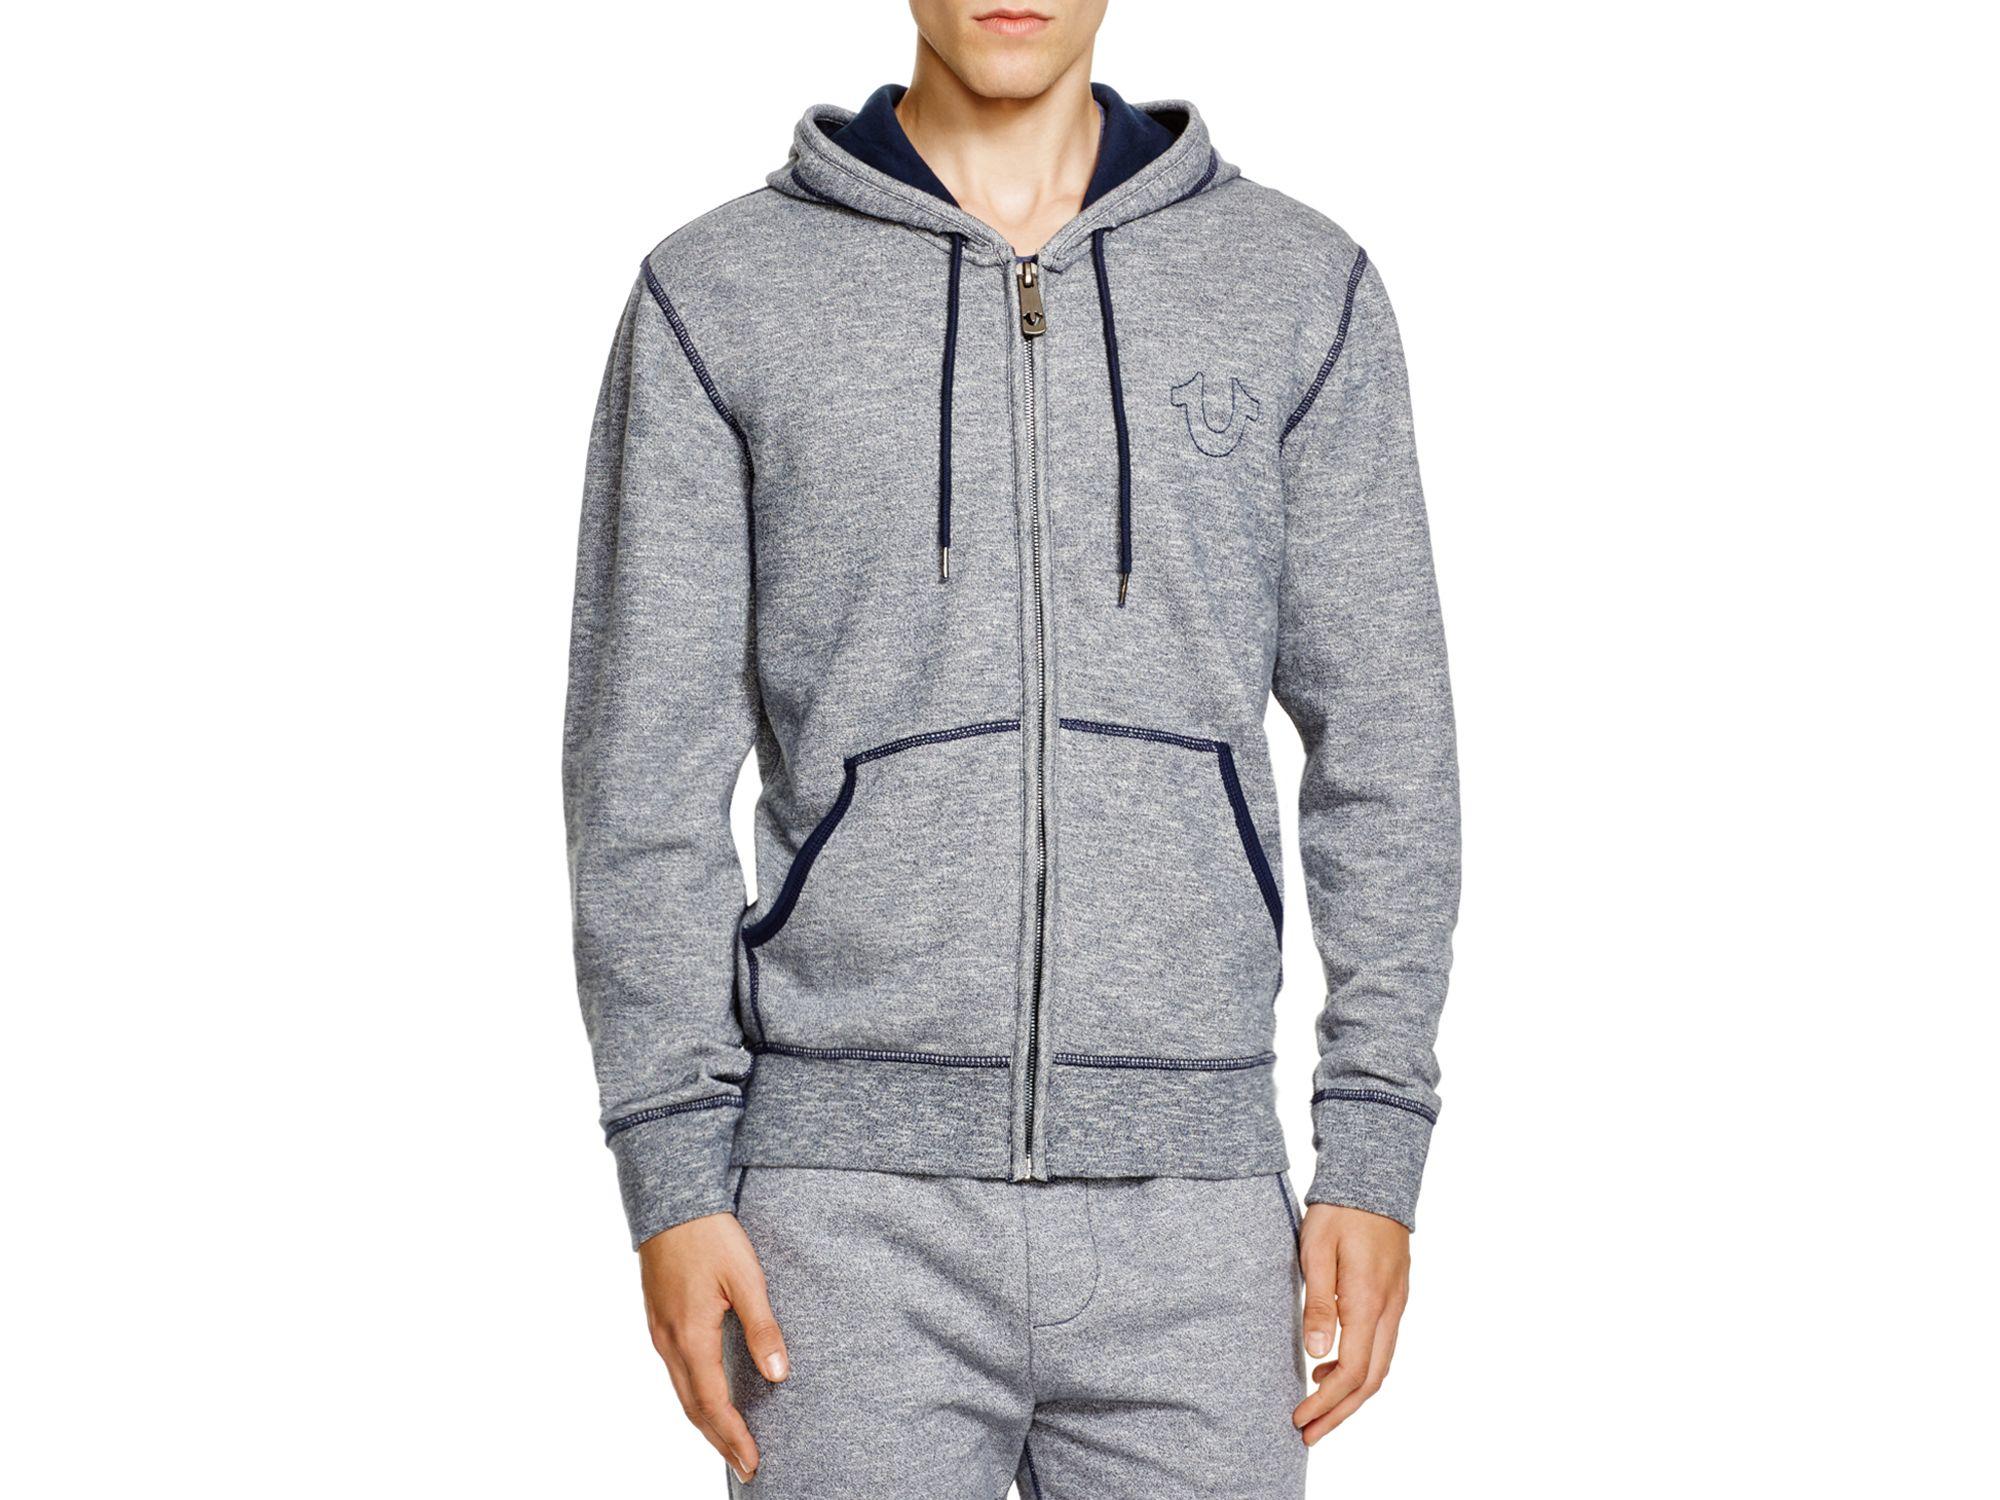 true religion active zip hoodie in gray lyst. Black Bedroom Furniture Sets. Home Design Ideas